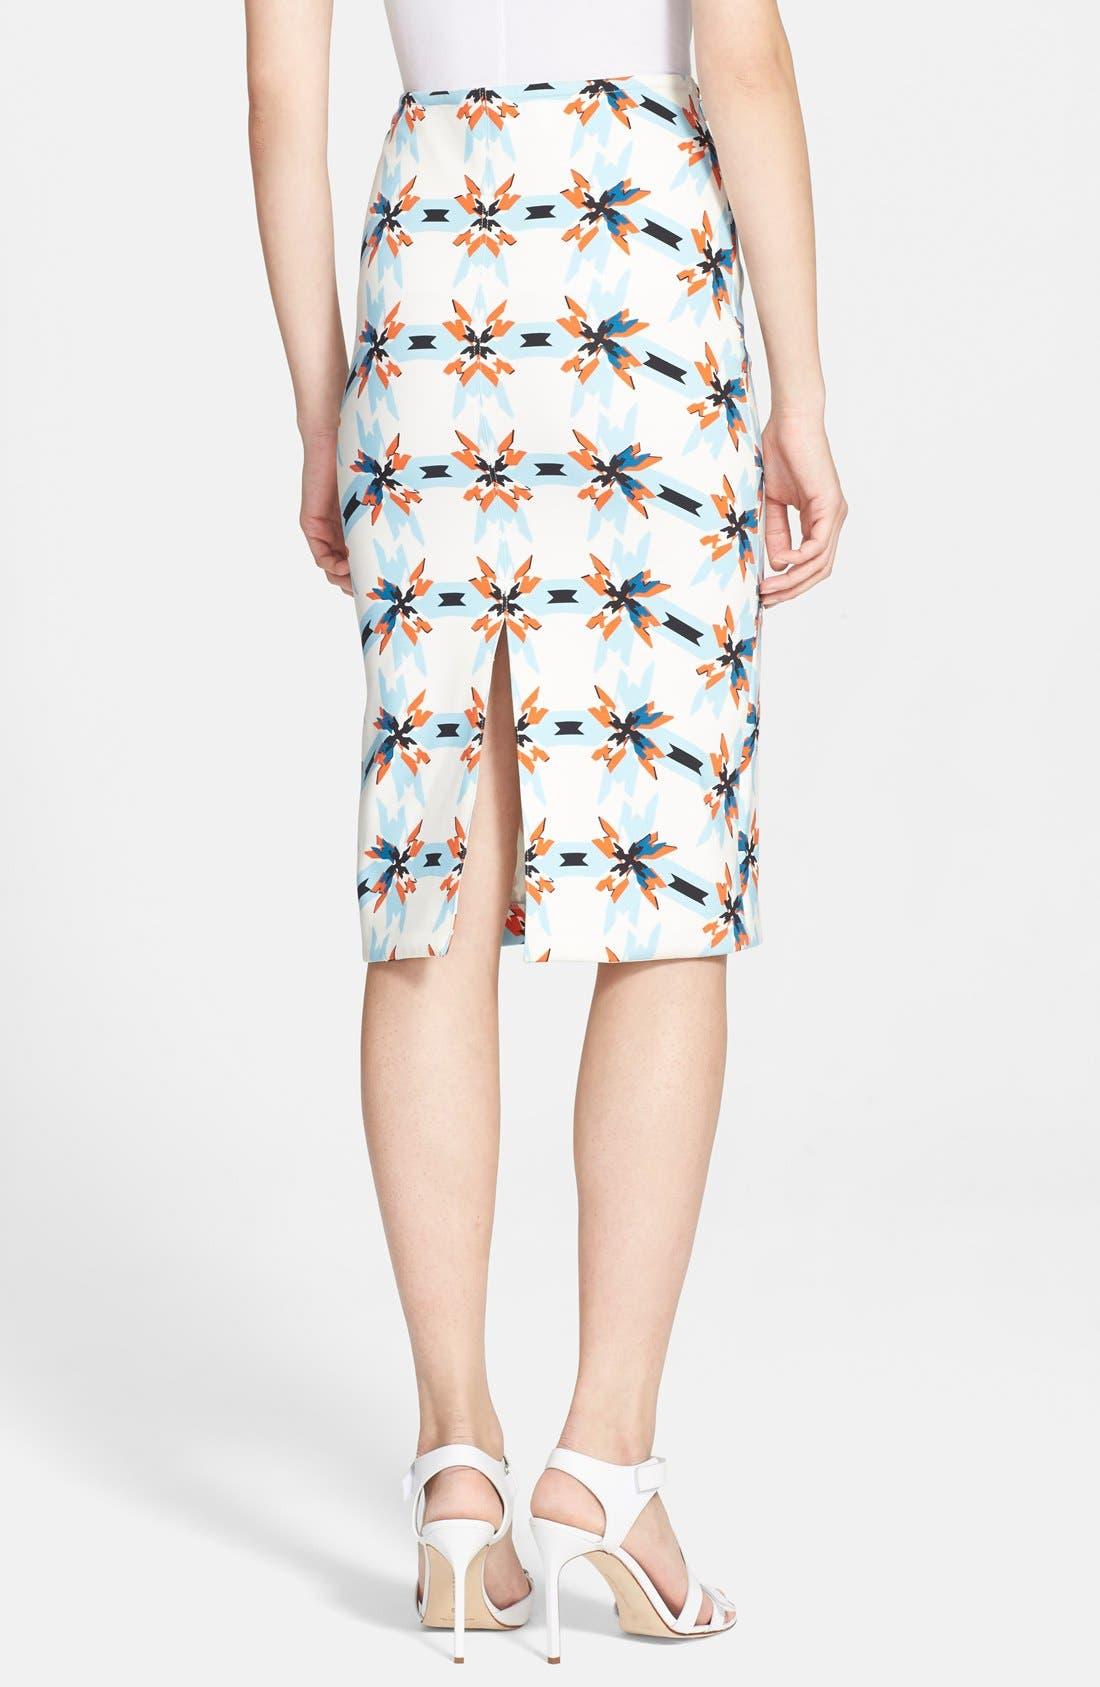 TANYA TAYLOR, 'Bundy' Print Pencil Skirt, Alternate thumbnail 3, color, 400